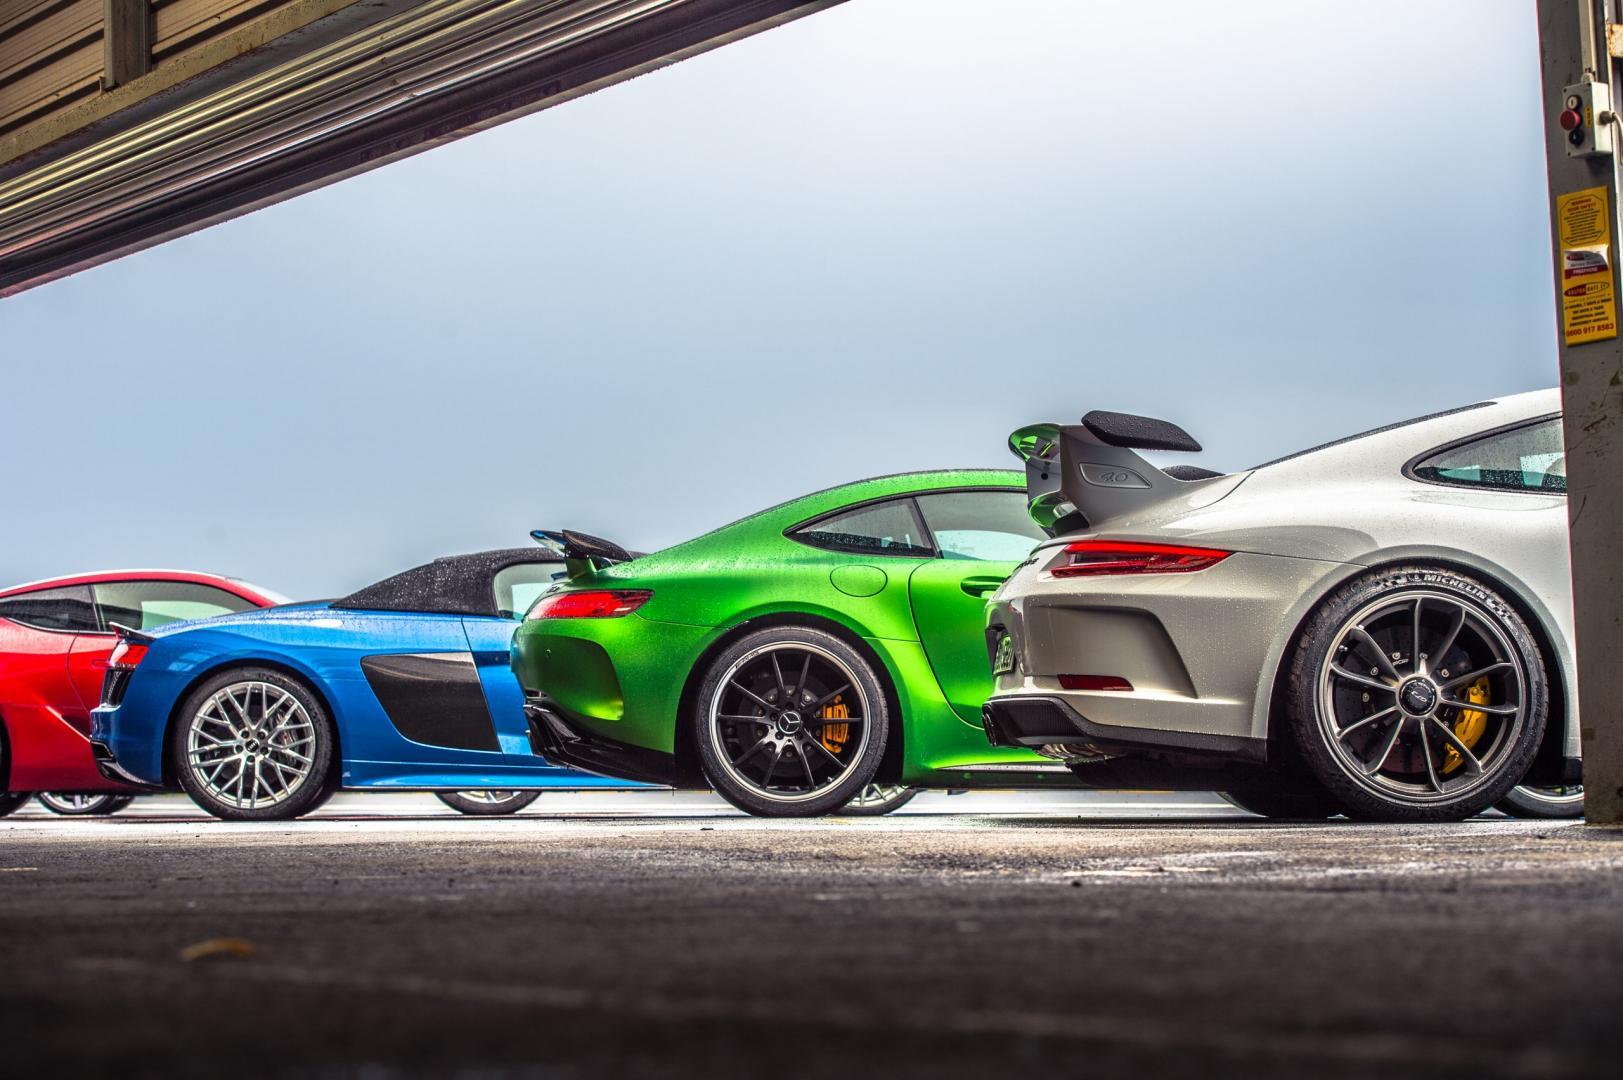 Lexus LC500 vs Audi R8 V10 Spyder vs Mercedes-AMG GT R vs Porsche 911 991 GT3